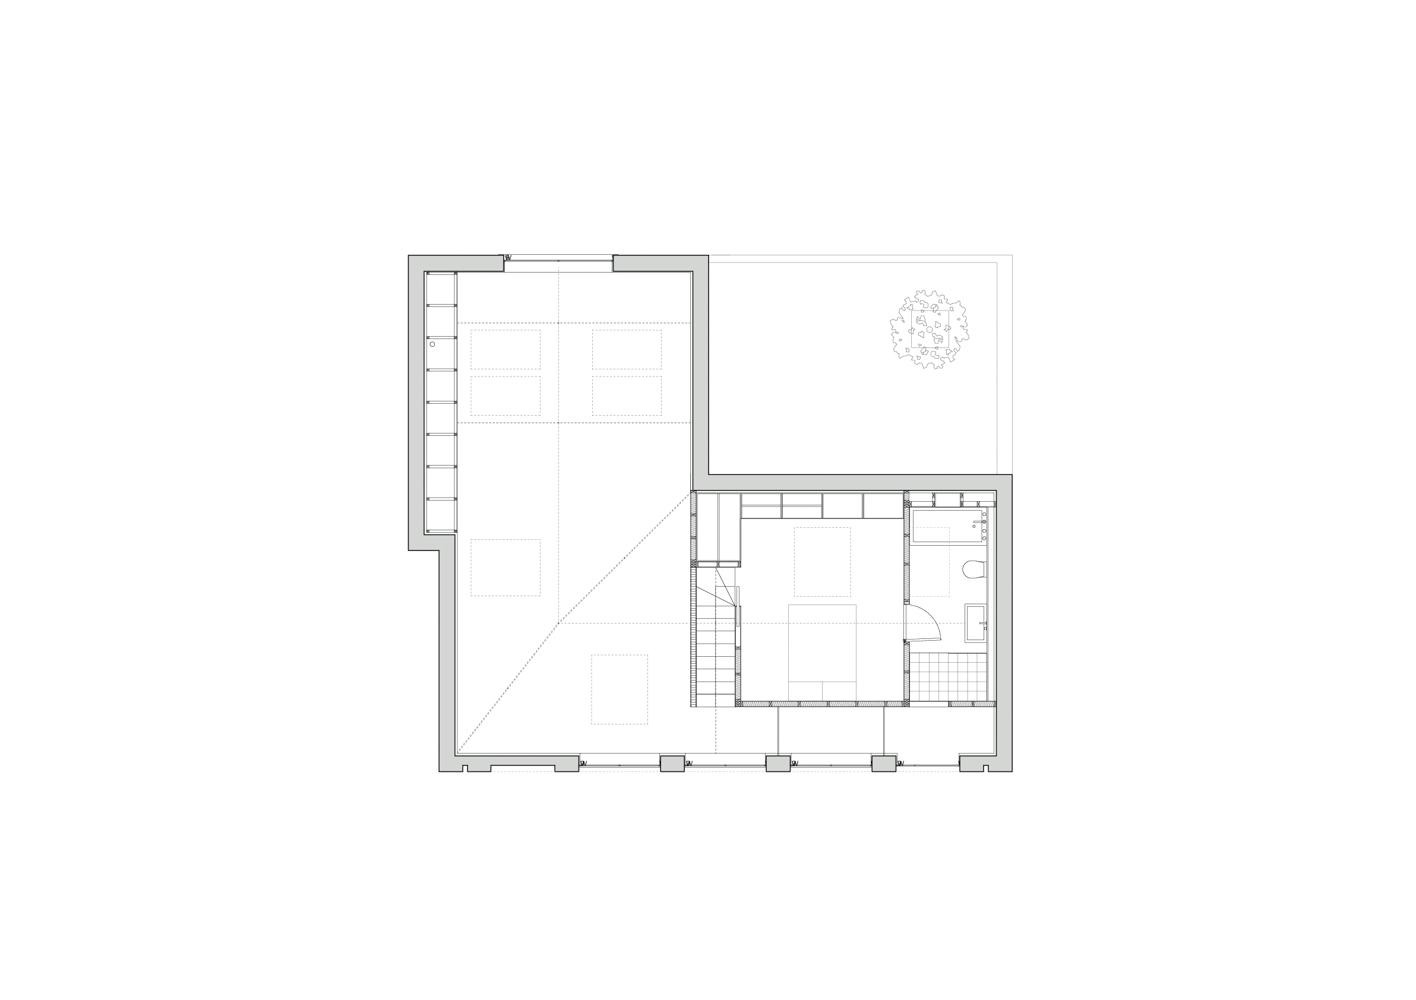 defoe-road-paper-house-project-the-design-emotive-23.jpg